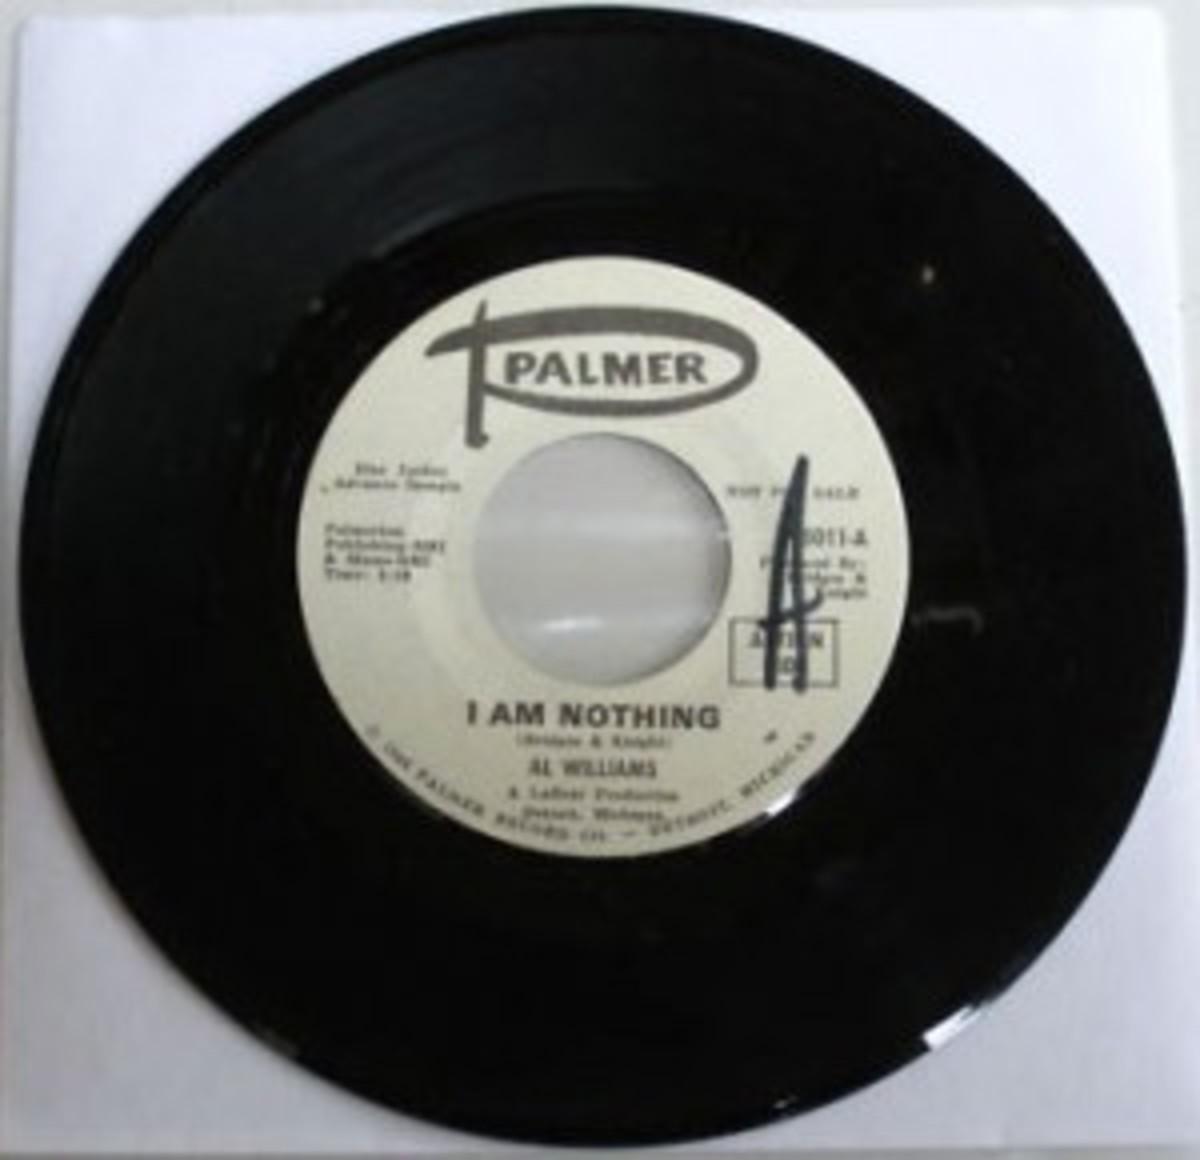 Al Williams Northern Soul